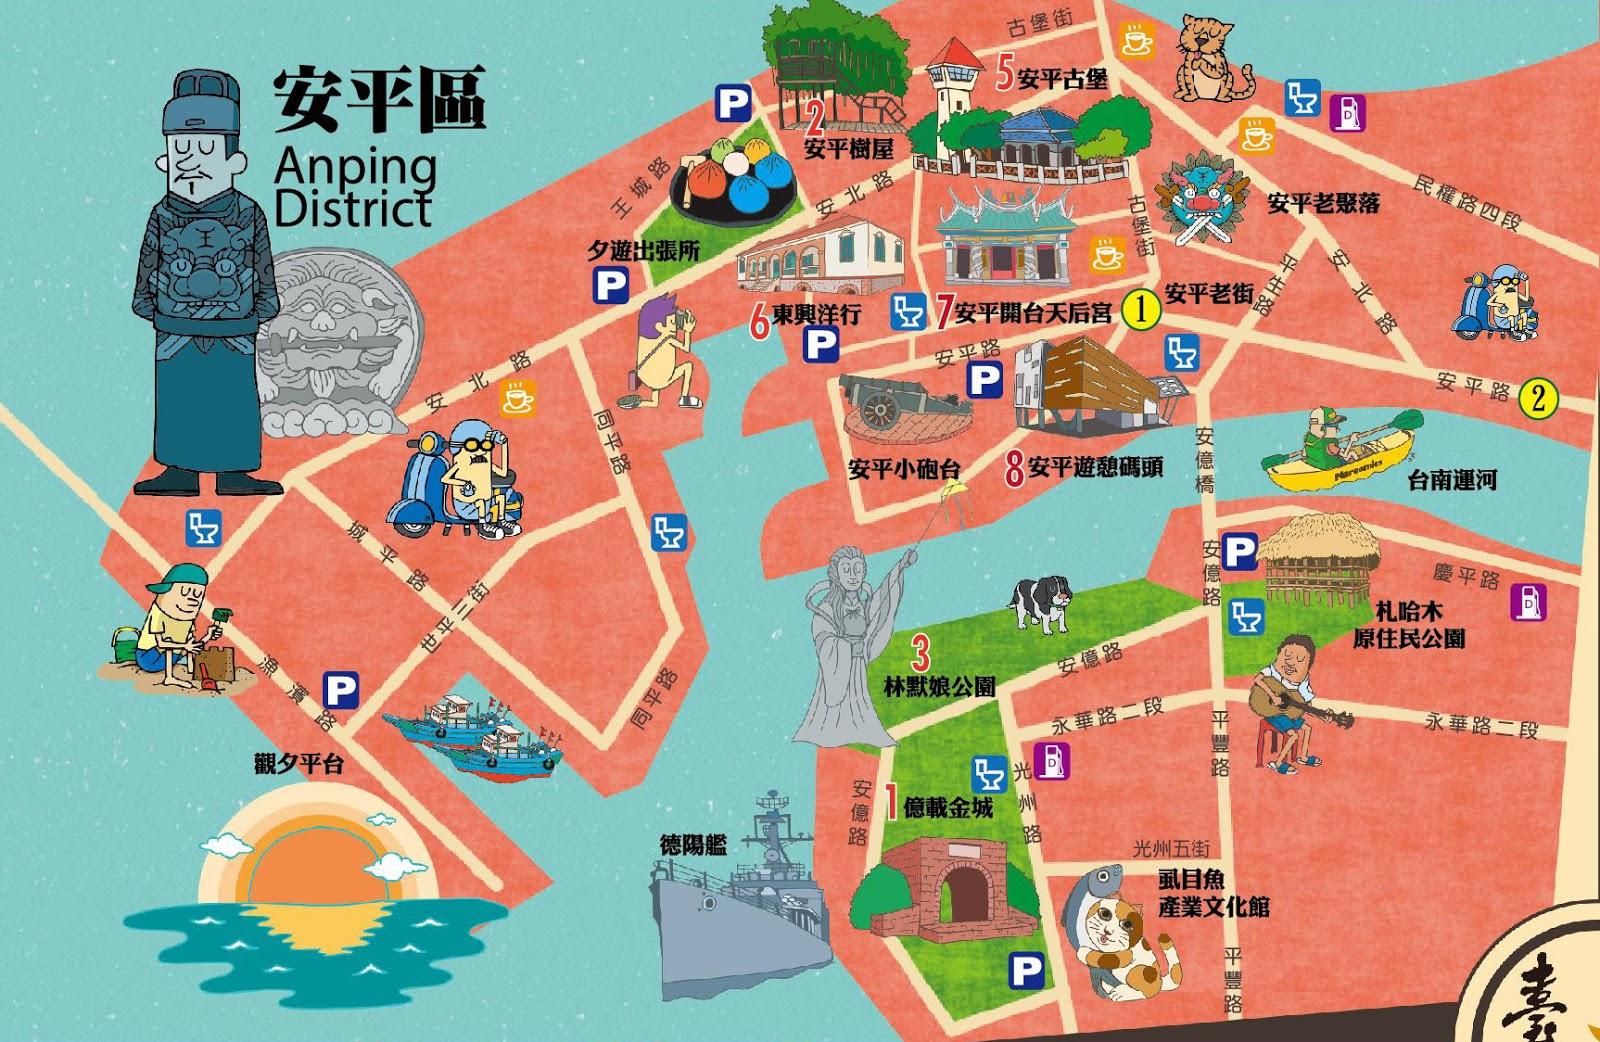 Averycase 非常窩 (包棟民宿): 臺南超好玩 地圖簡介